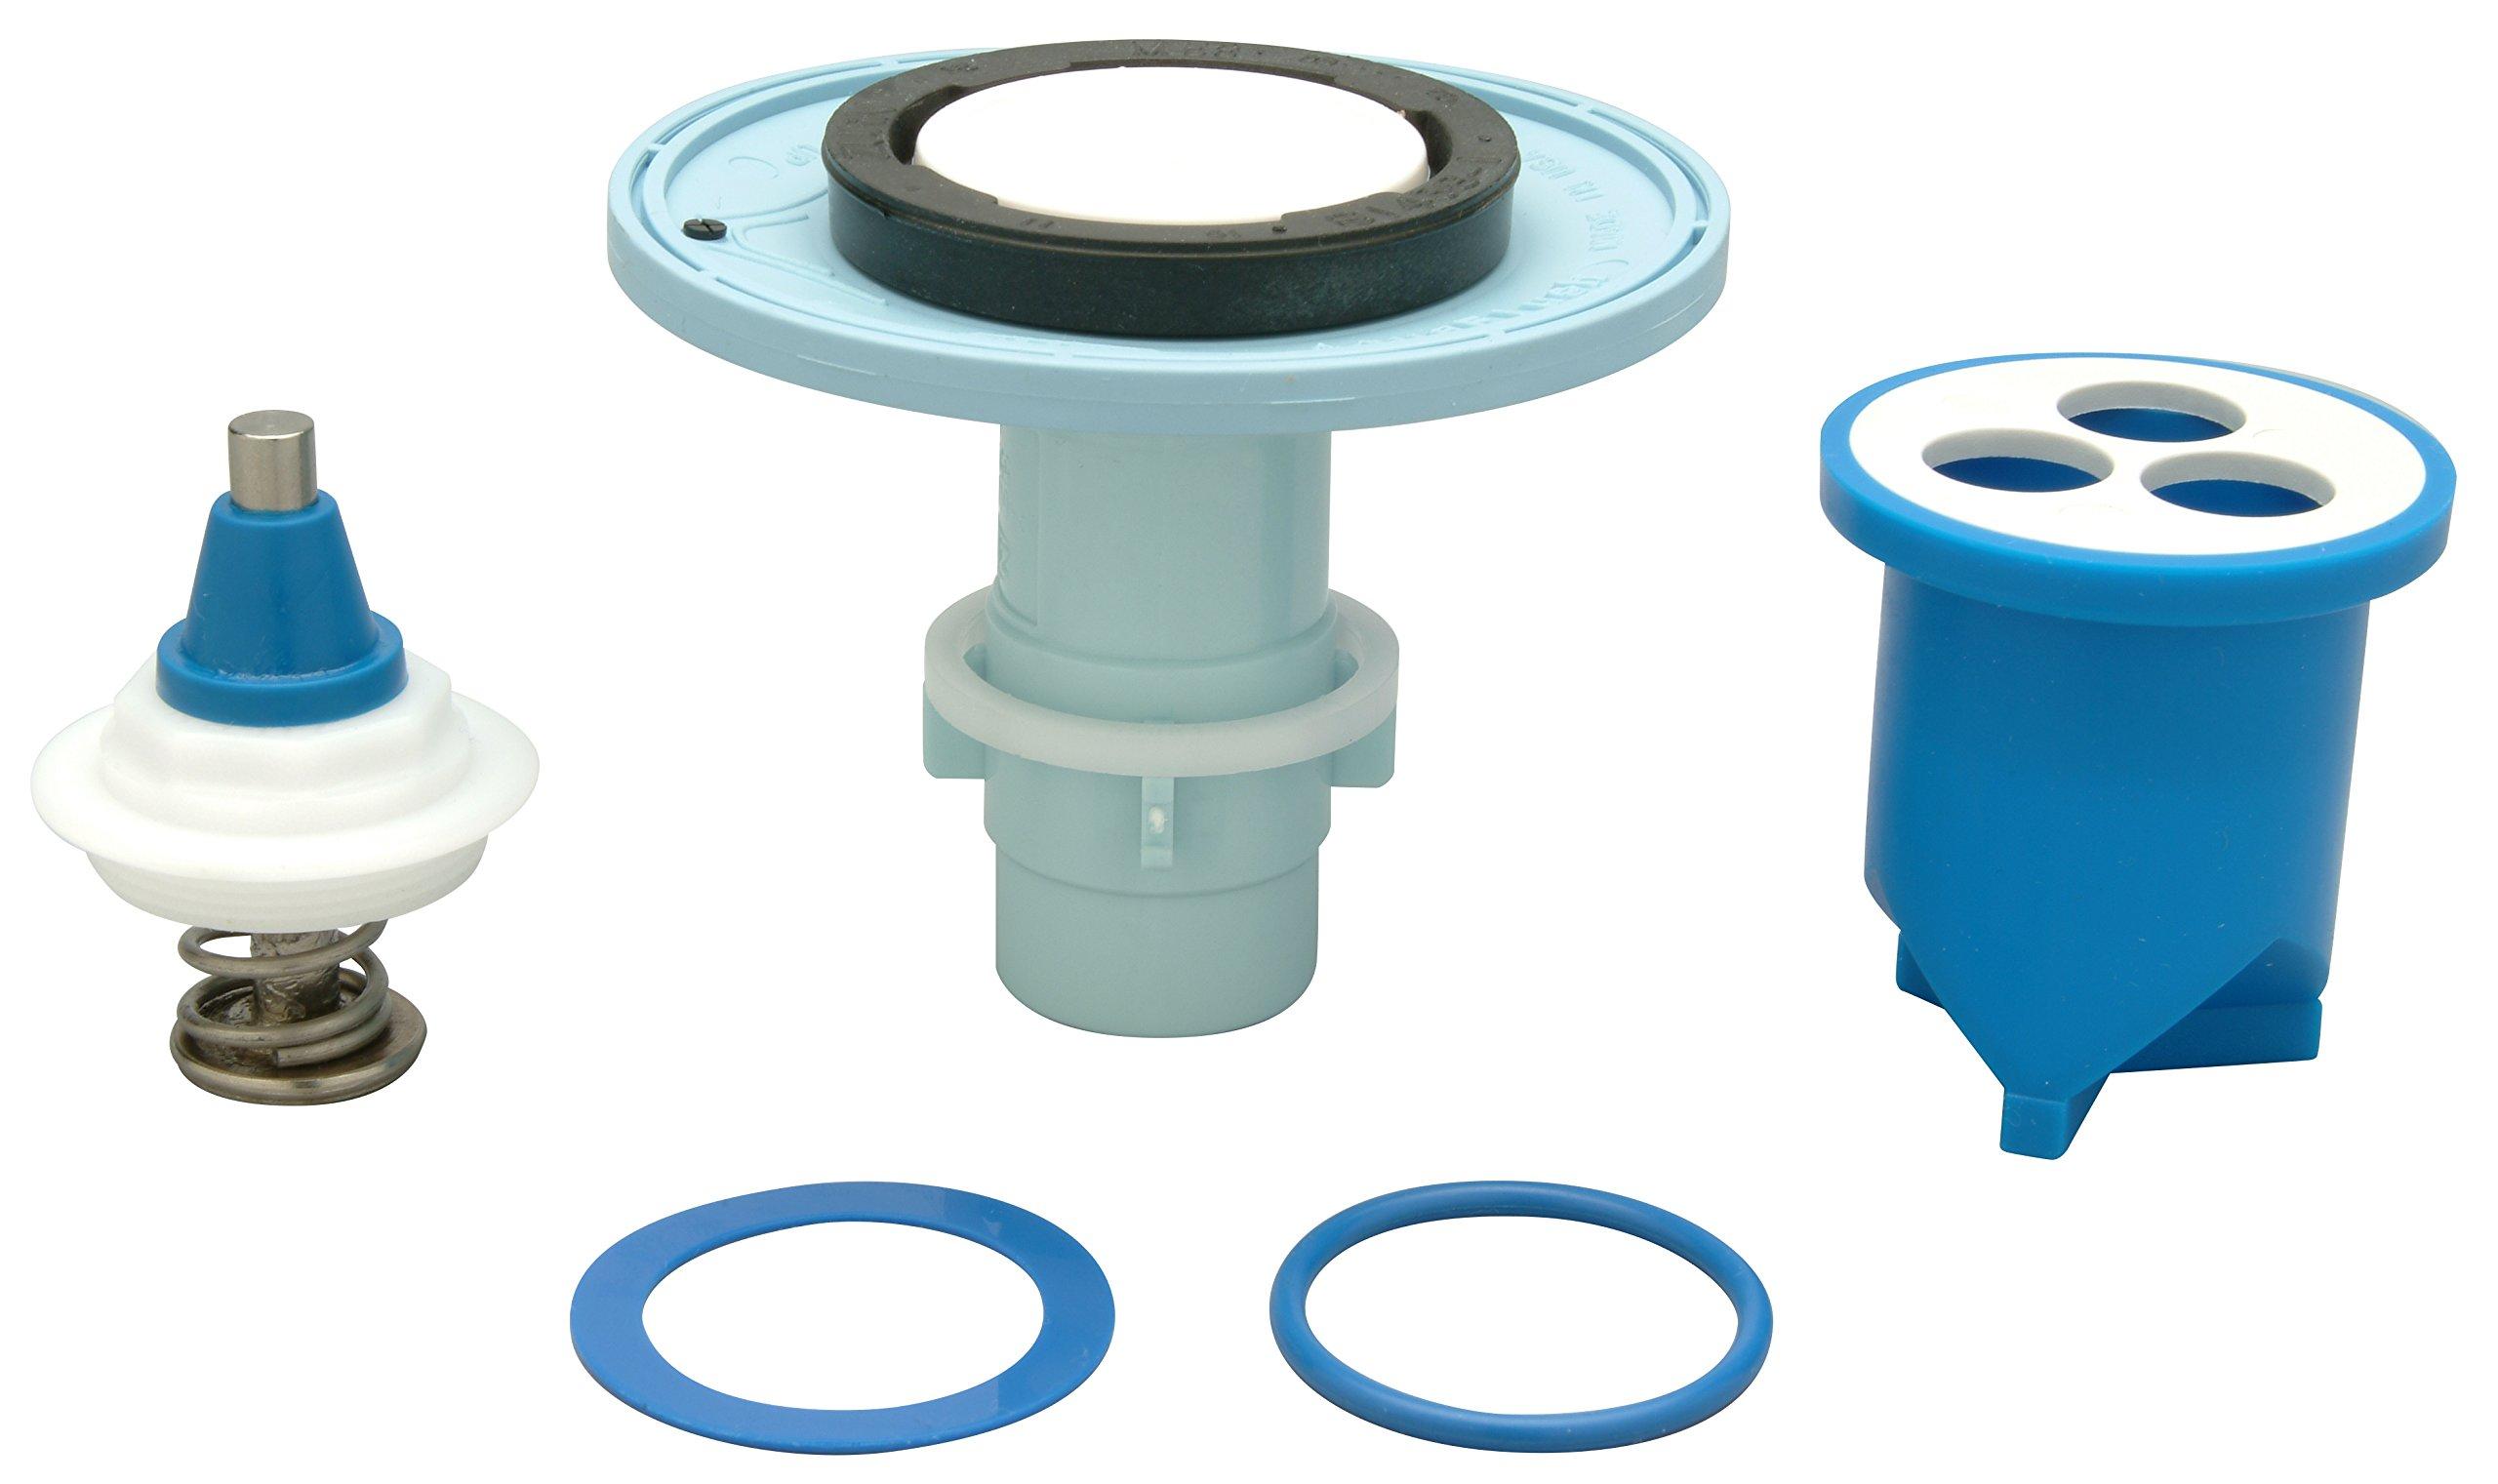 Zurn P6000-ECR-WS1-RK 1.6 gpf Closet Aquaflush Diaphragm Kit Rebuild Kit by Zurn